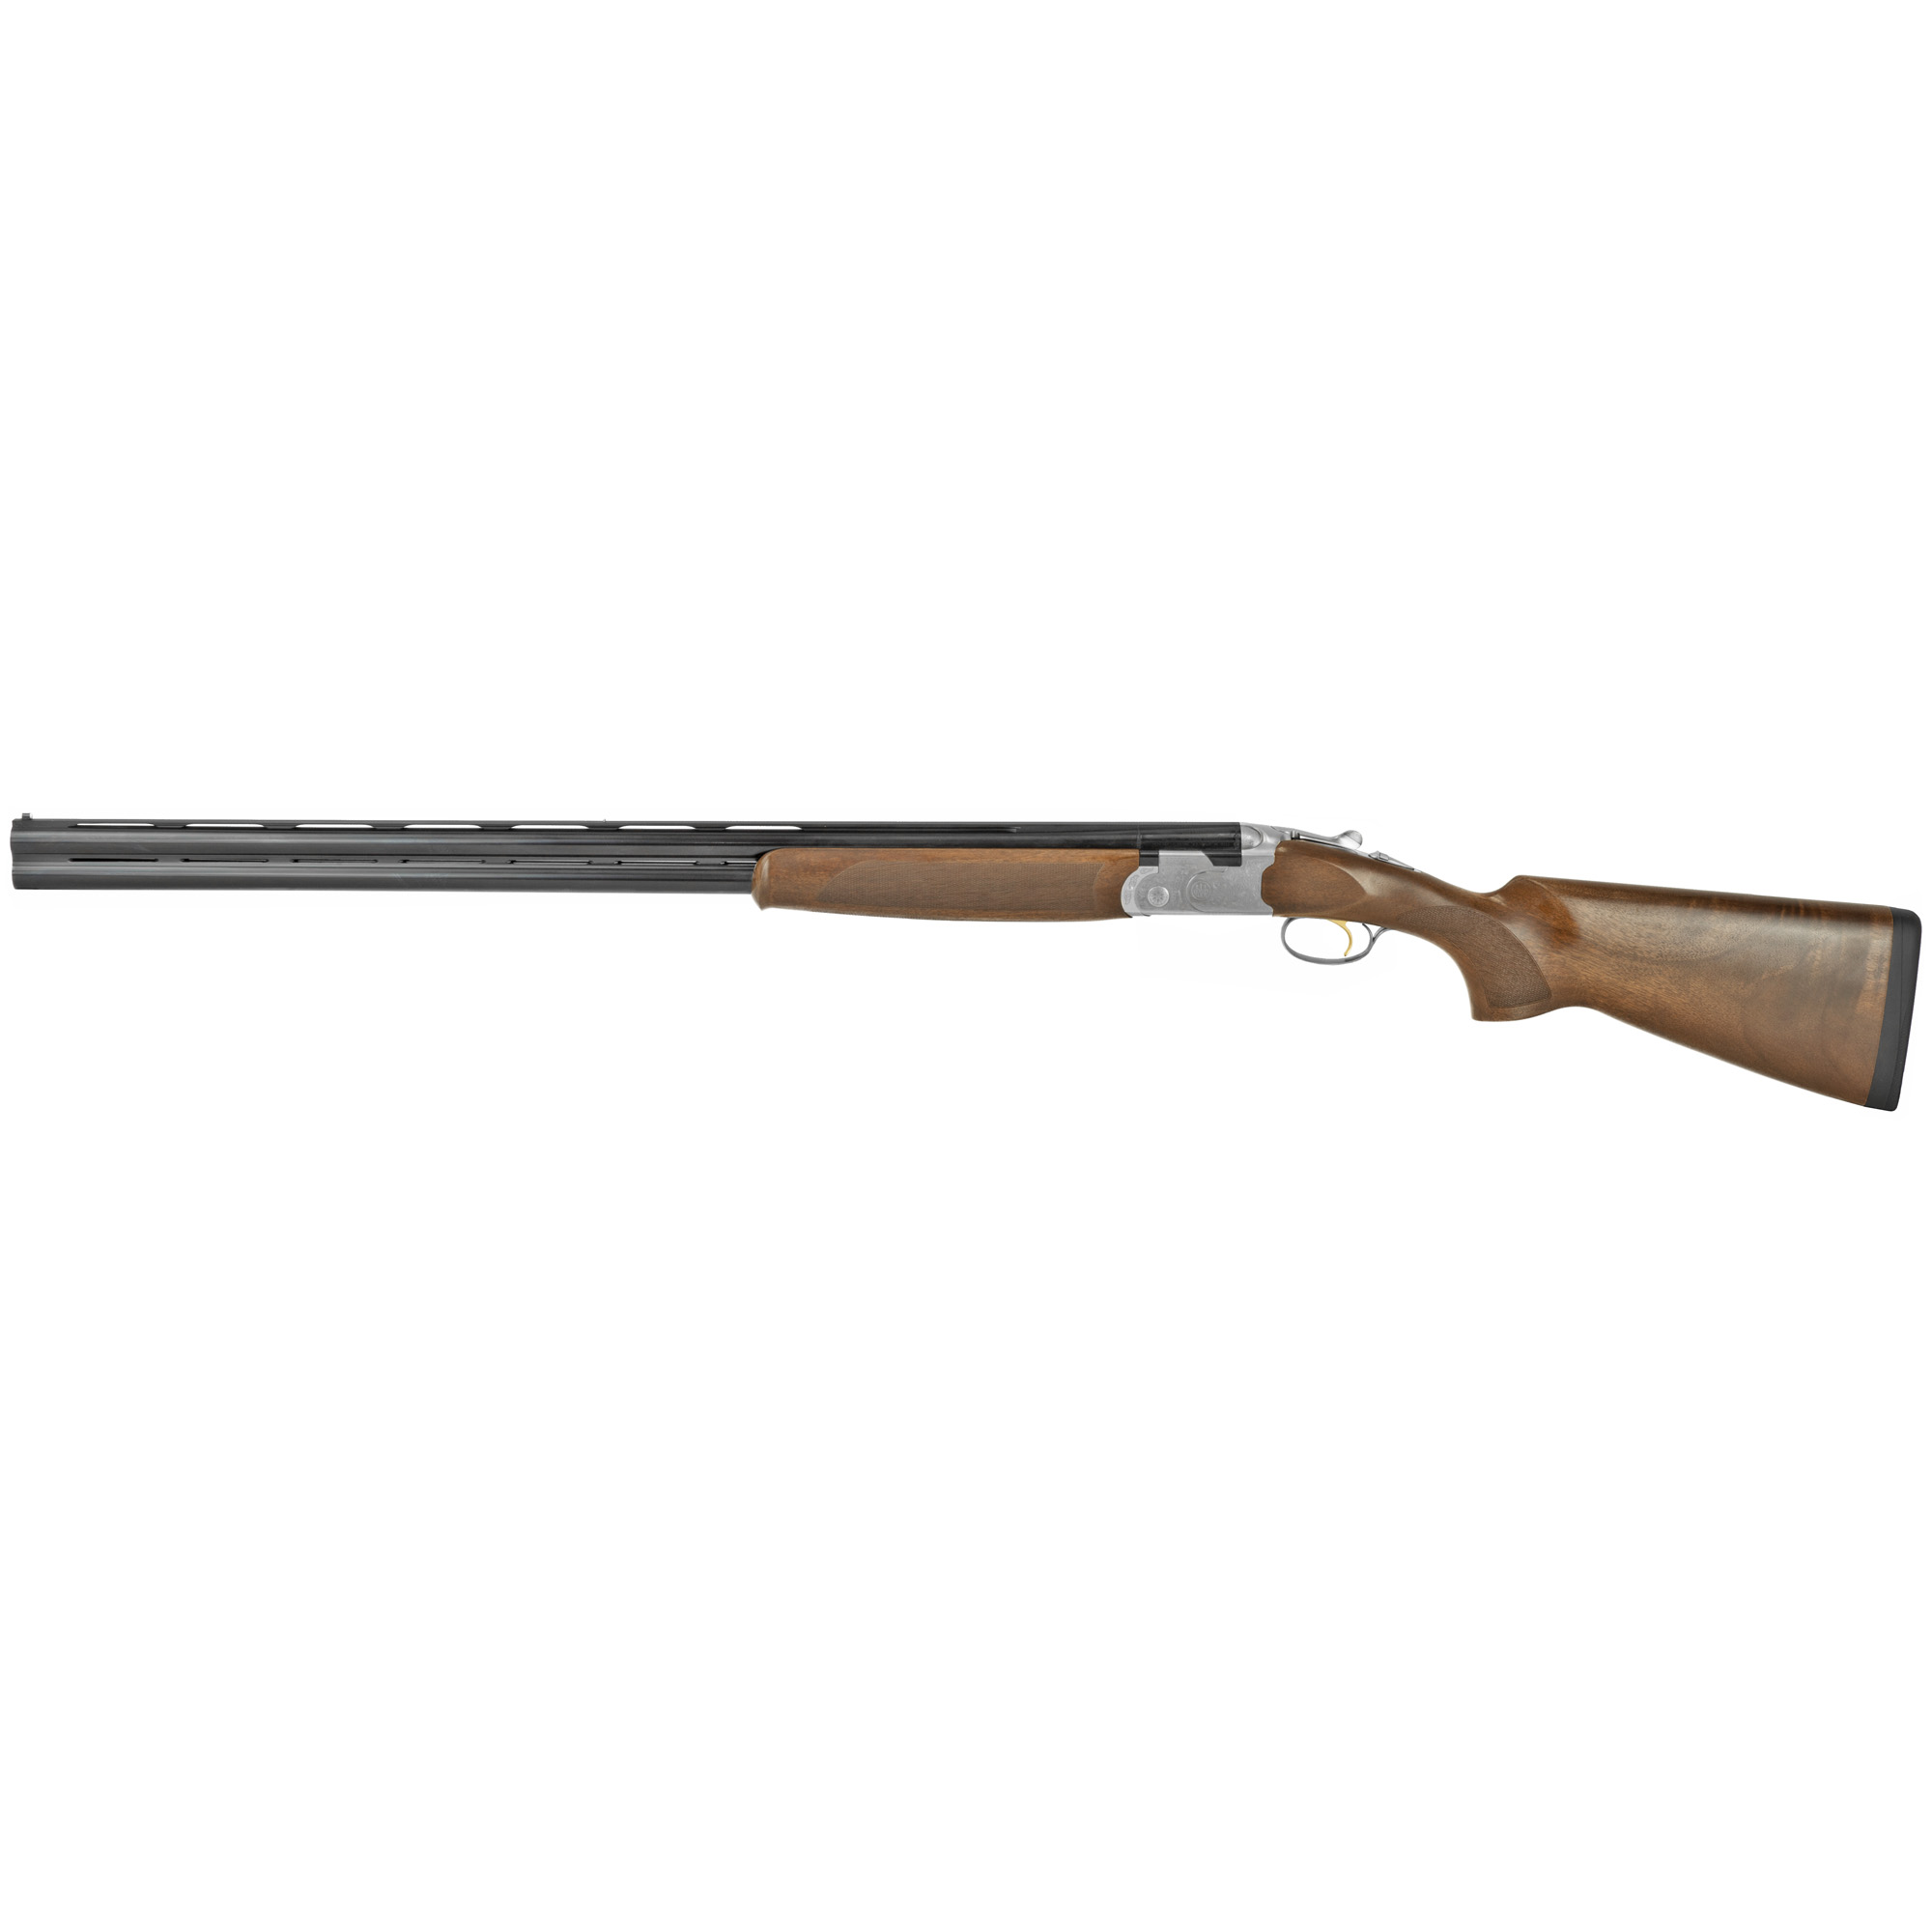 Beretta 686 Slvr Pigeon Spt Lh 12/32